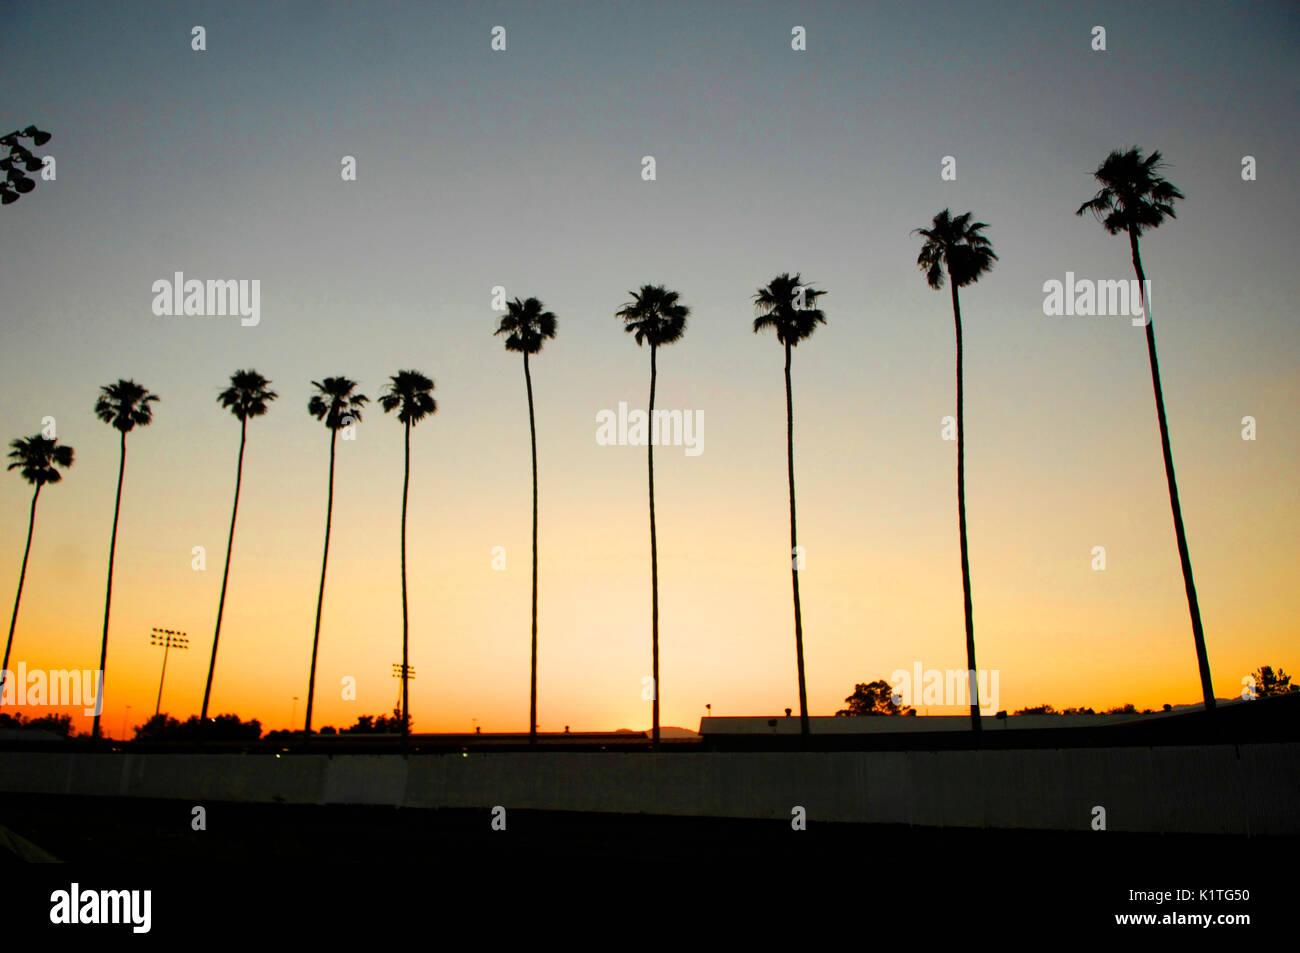 Palm tree sunset 2008 Vans Warped Tour Pomona Fairgrounds Pomona. - Stock Image